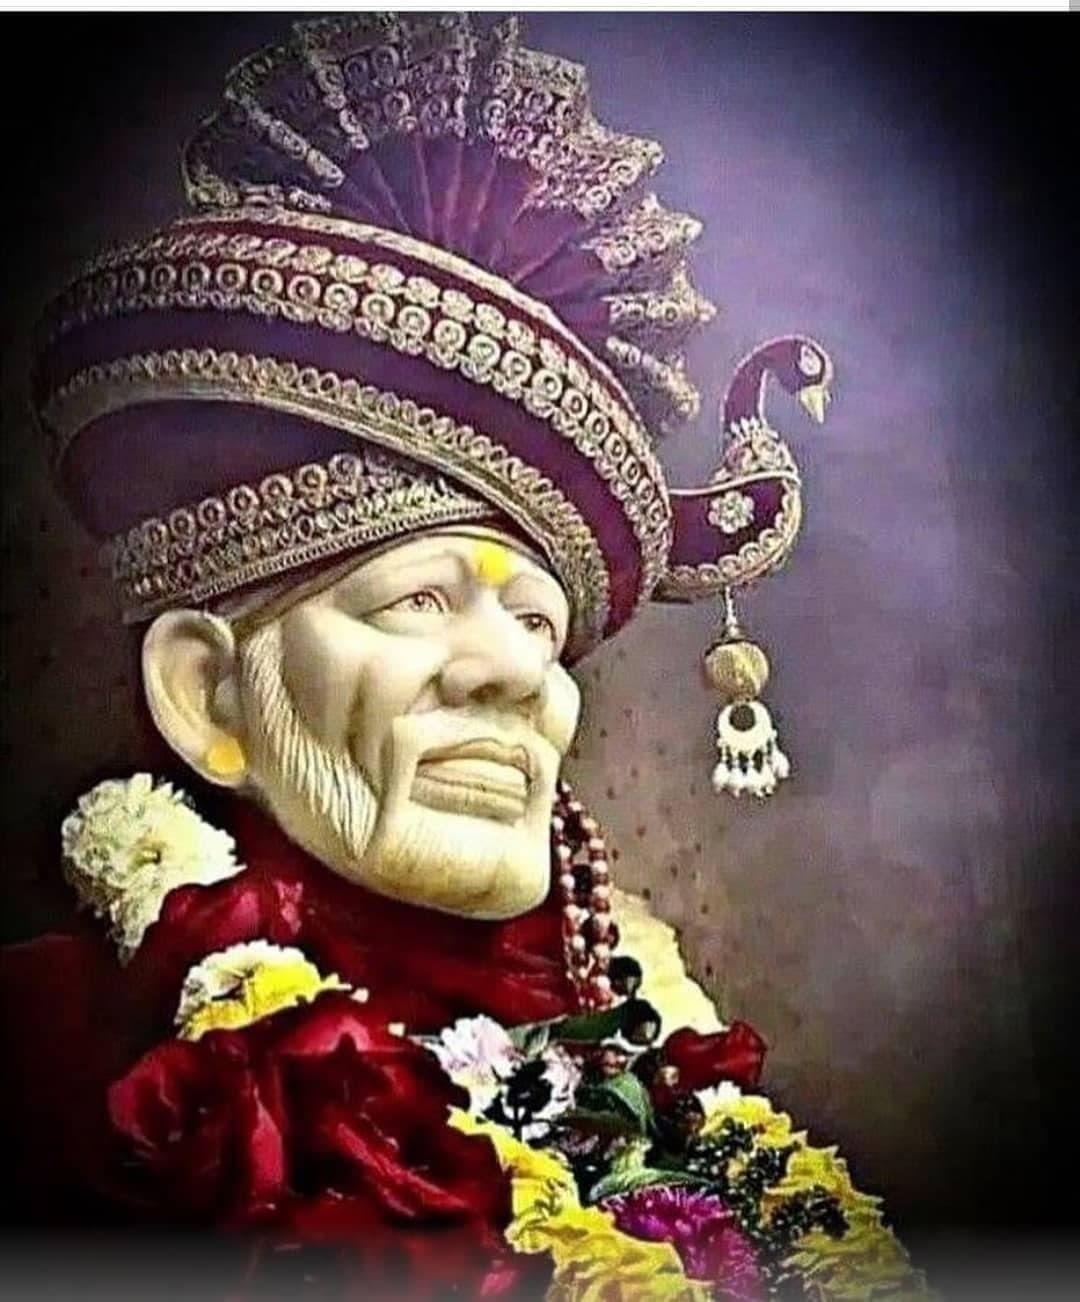 50 Sai Baba Images In Hd Vedic Sources Sai Baba Hd Wallpaper Sai Baba Wallpapers Sai Baba